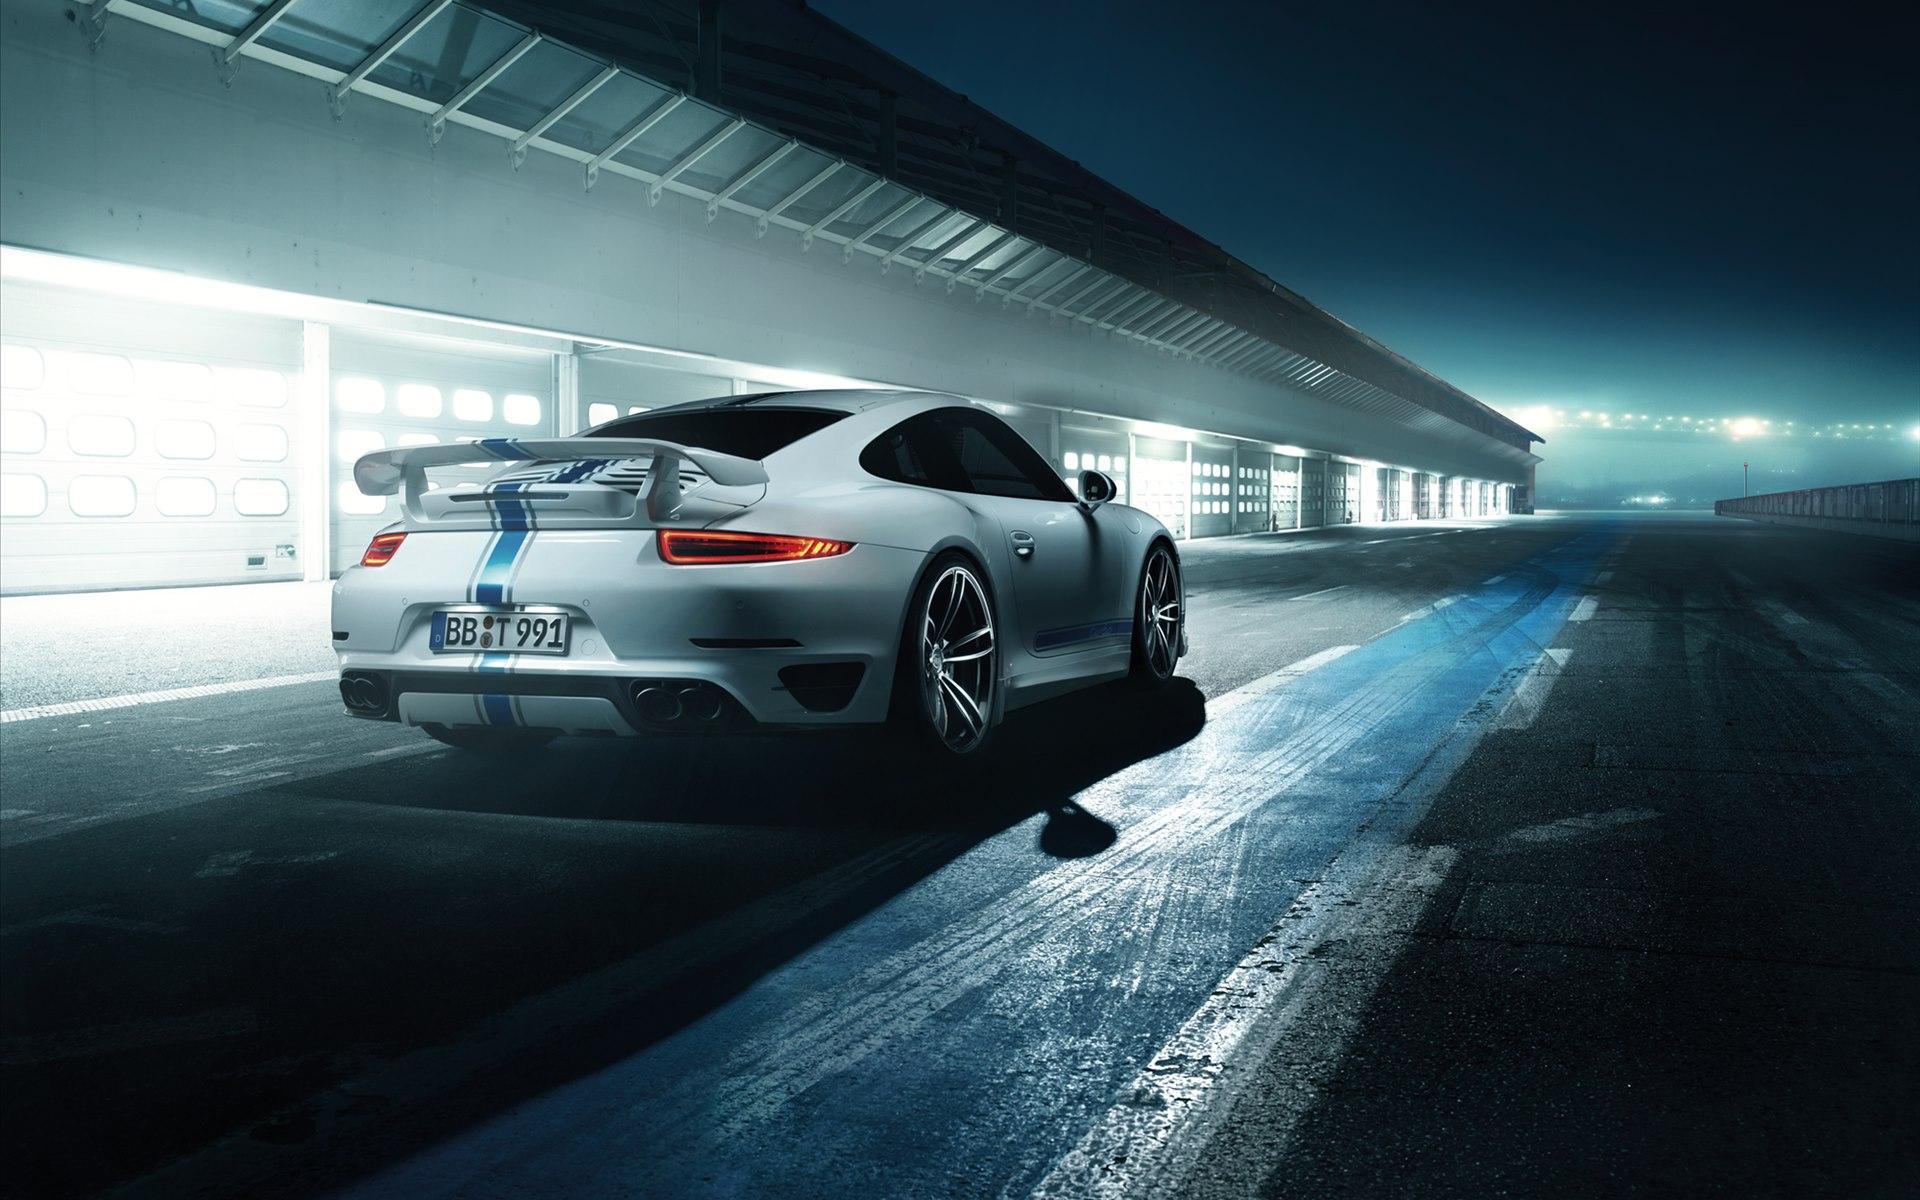 techart porsche 911 turbo s 2014 wallpaper hd car wallpapers - Porsche 911 Turbo 2014 Wallpaper